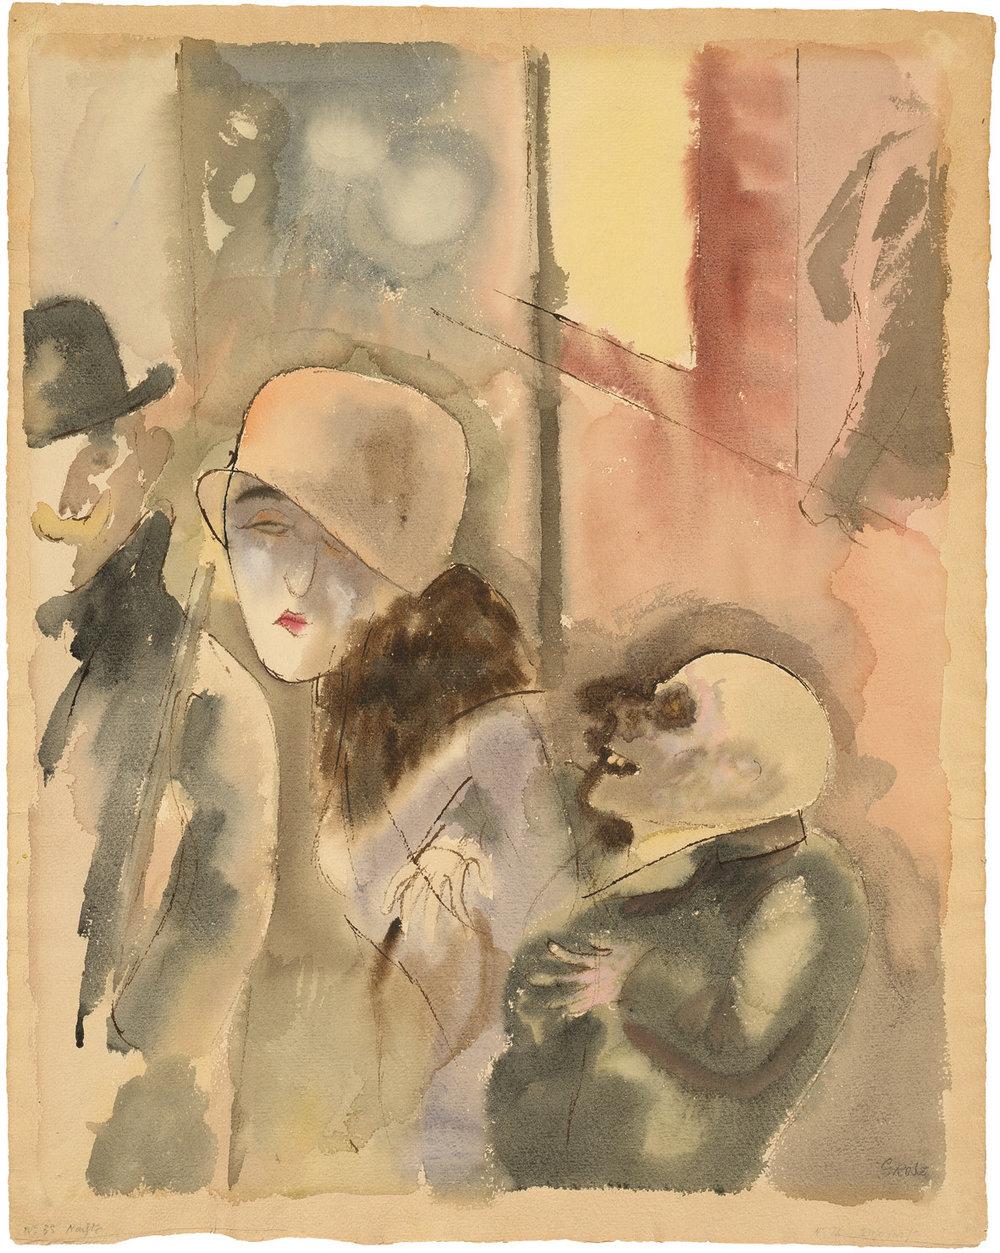 George Grosz, Nachts, Aquarell und Feder, 1916.  George Grosz: © Estate of George Grosz, Princeton, N.J. / VG Bild-Kunst, Bonn.